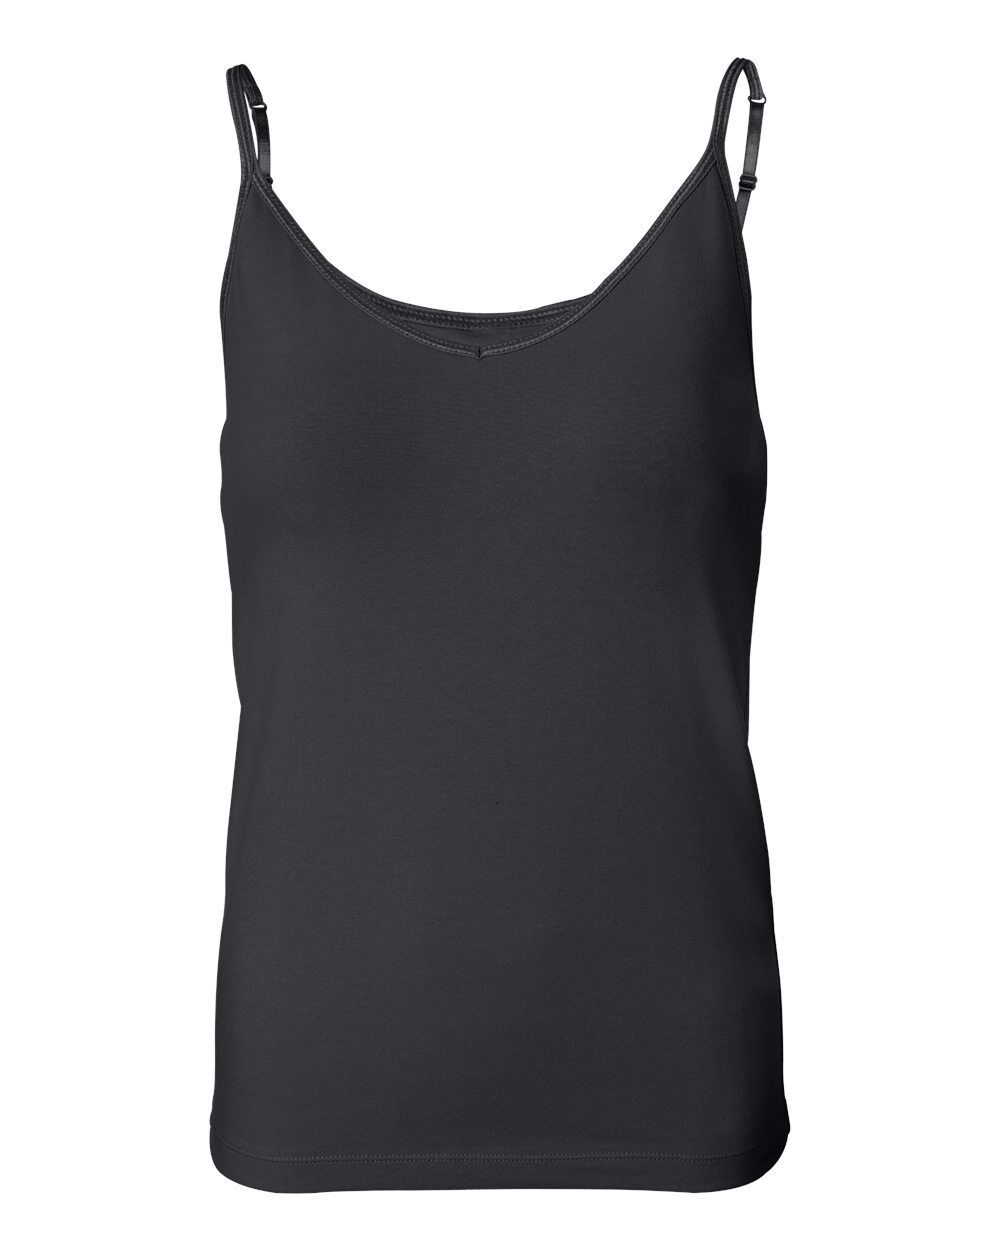 Bella Ladies S M L XL 2XL Spandex Camisole Yoga Tank Top